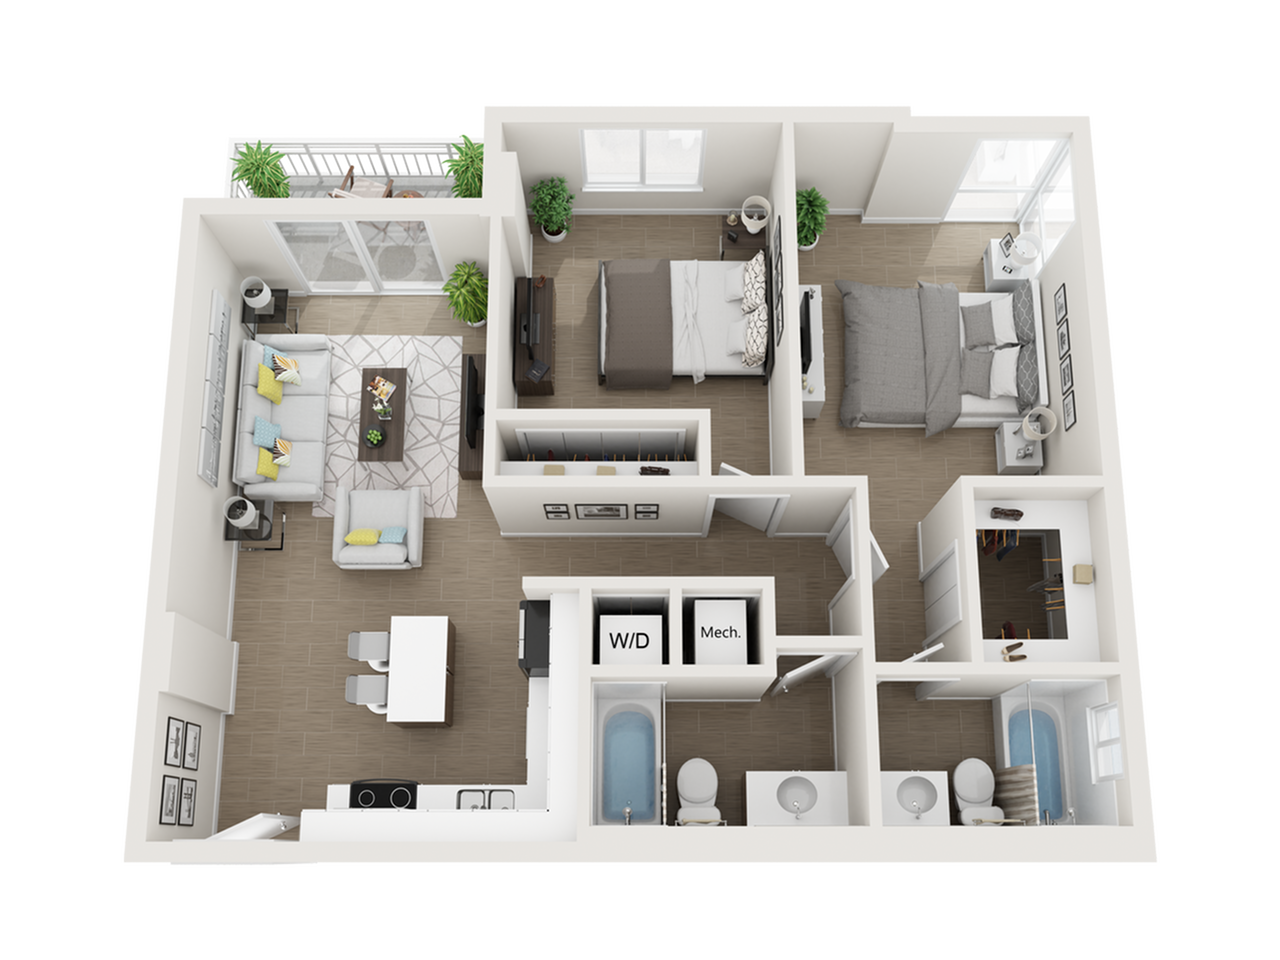 Burley ll two bedroom two bathroom 3D floor plan